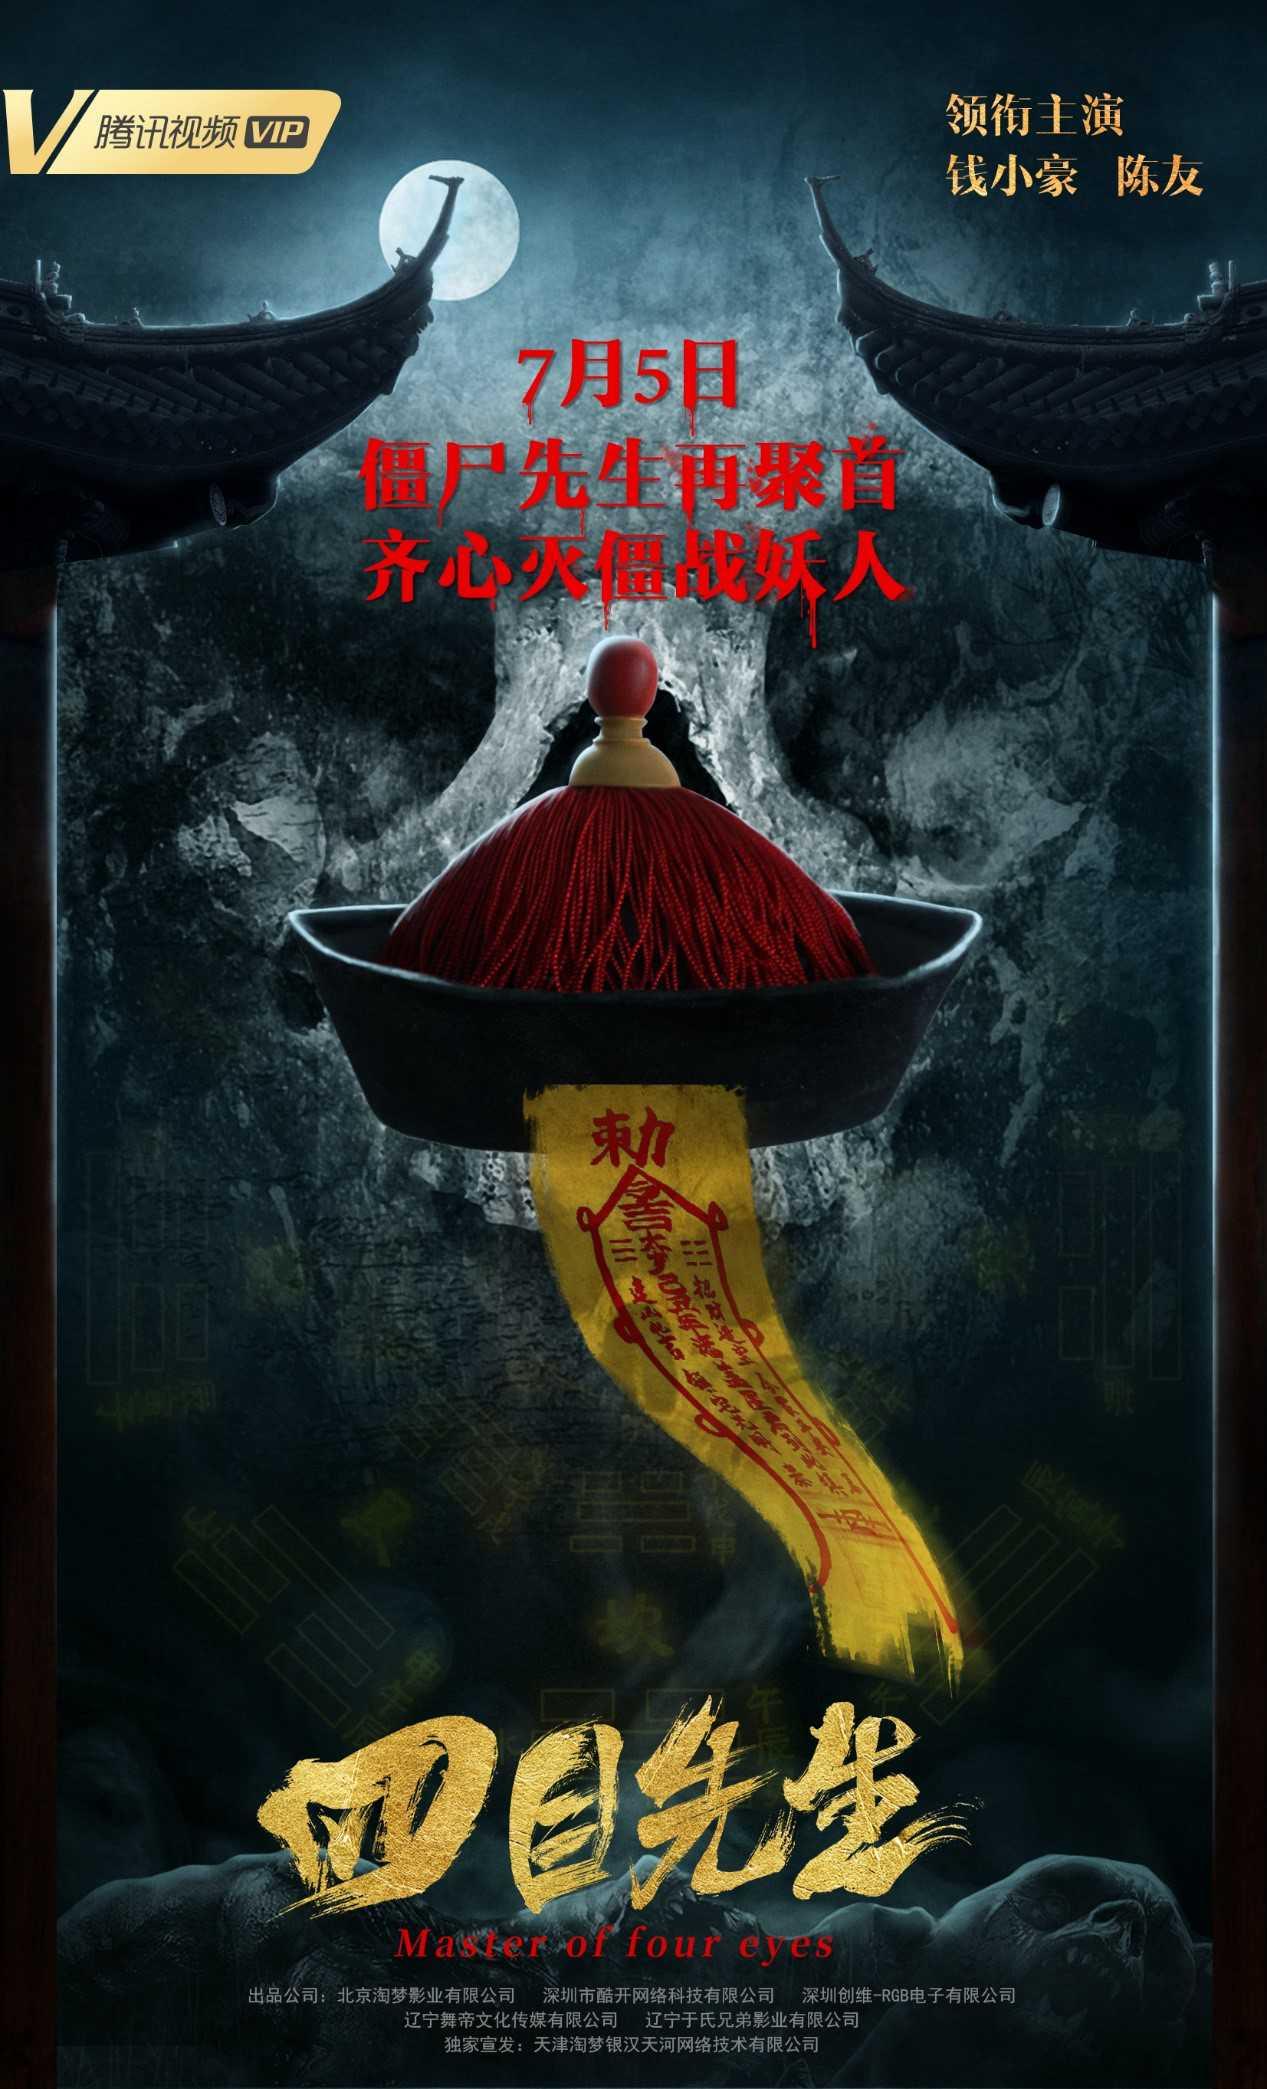 http://www.e5s-okinawa.com/chalingyule/134091.html